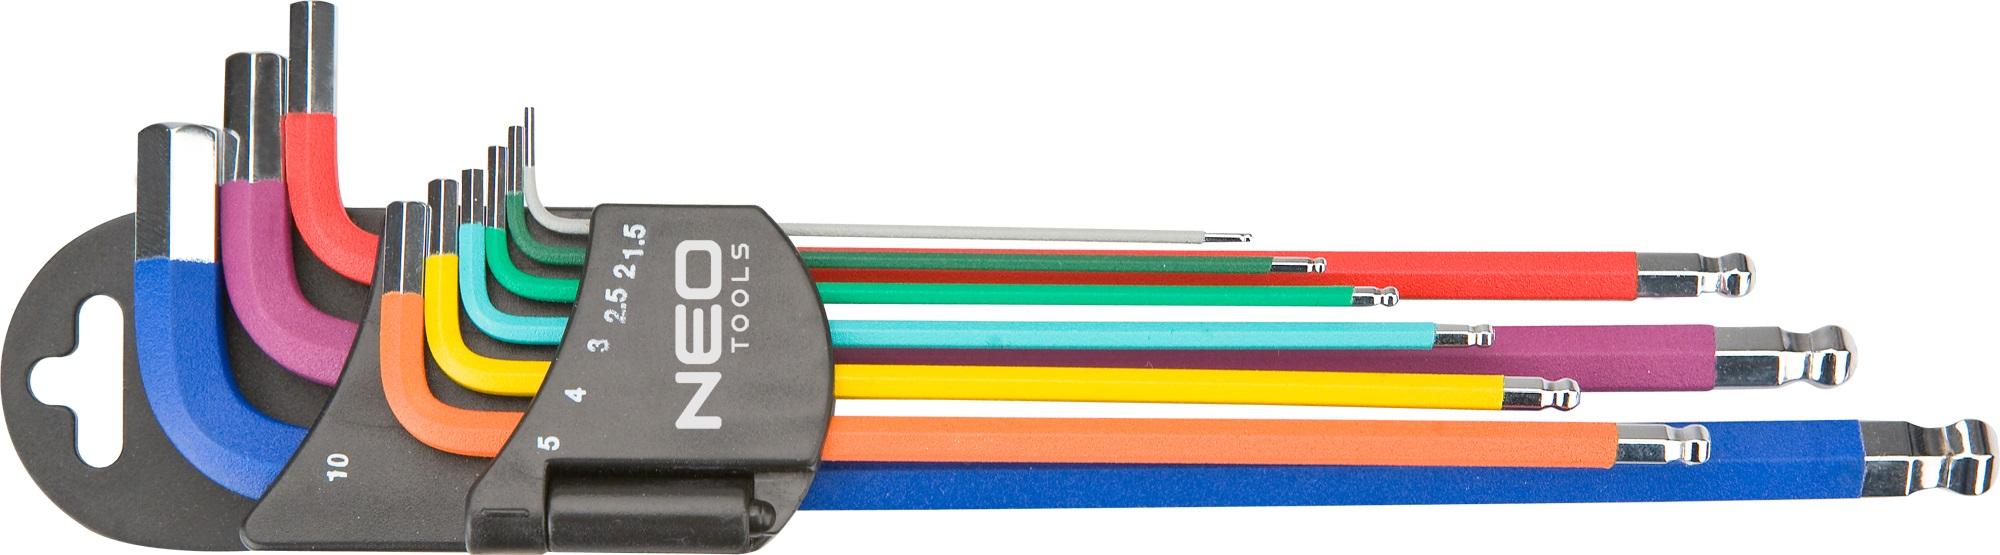 Neo Tools 09-512 Ключi шестиграннi, 1.5-10 мм, набiр 9 шт.*1 уп.